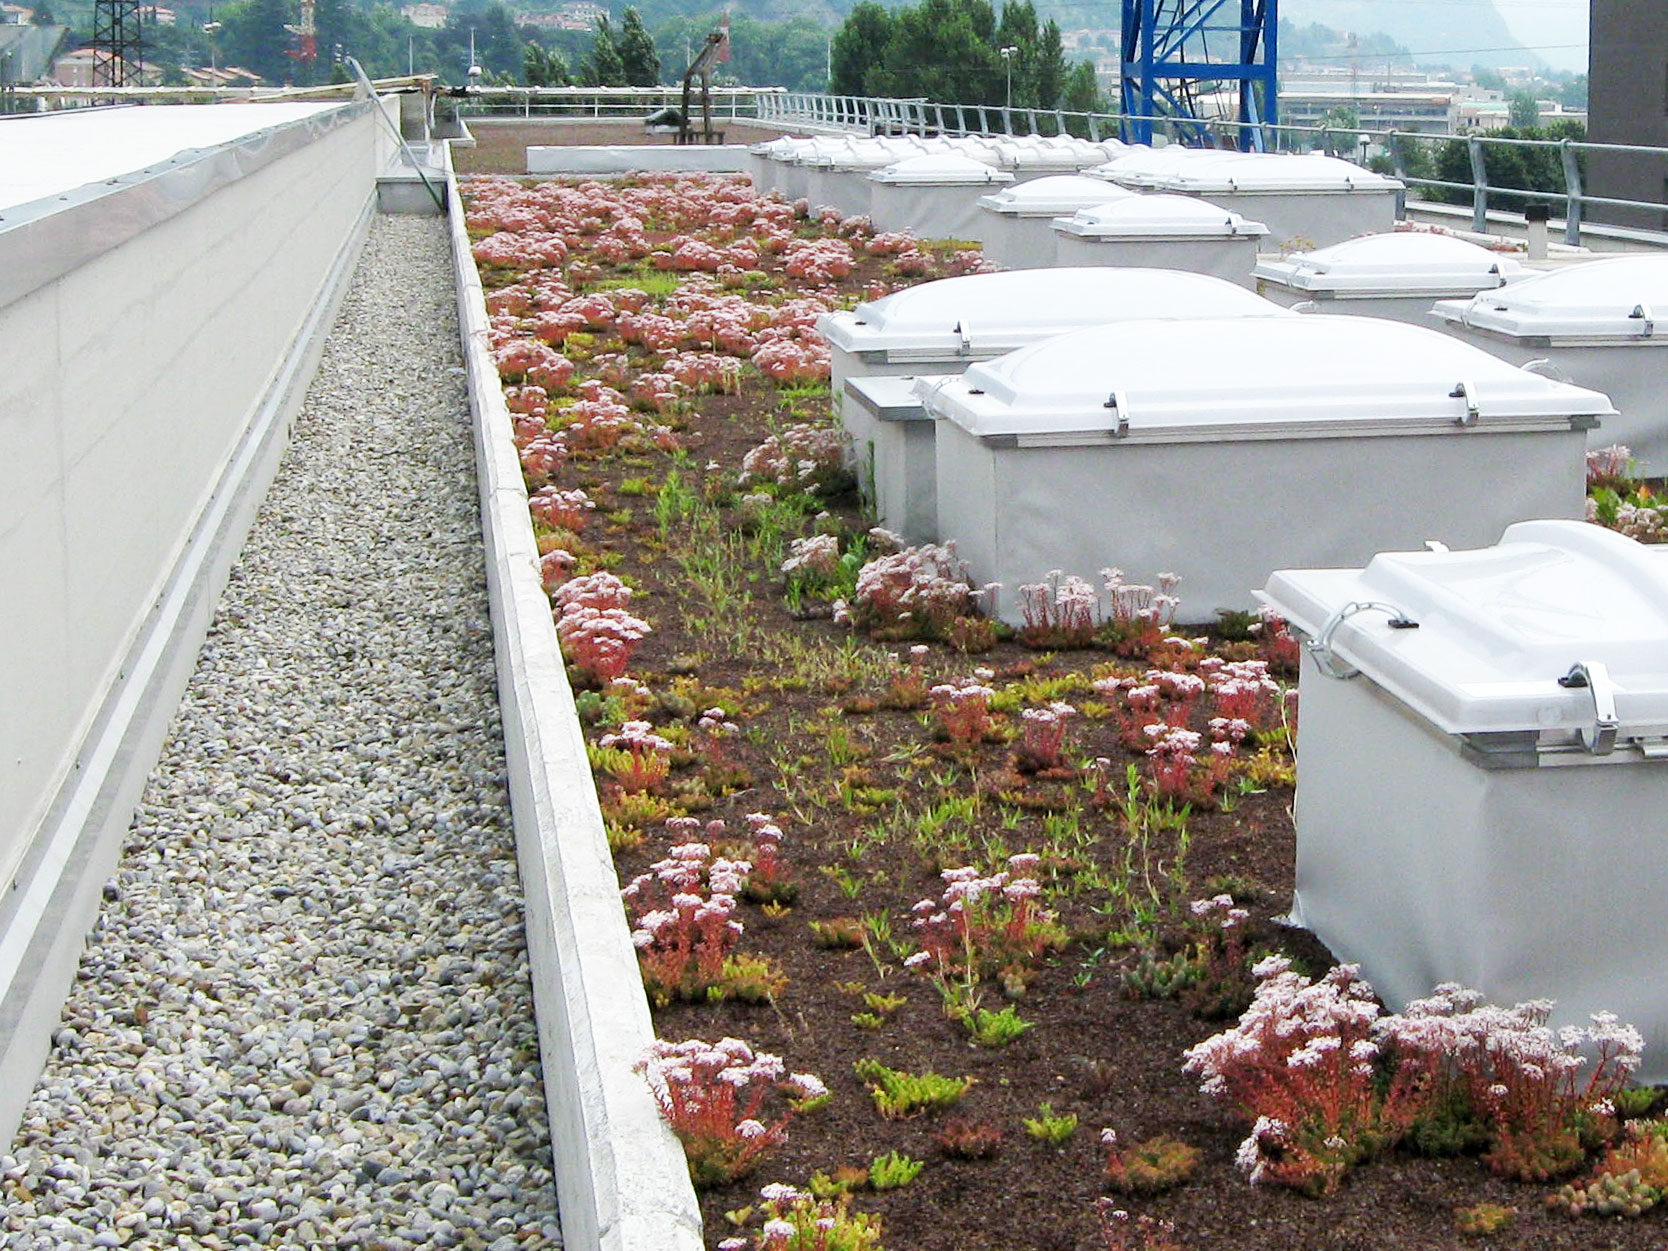 Giardini pensili e tetti verdi saci srl brescia for Giardini pensili